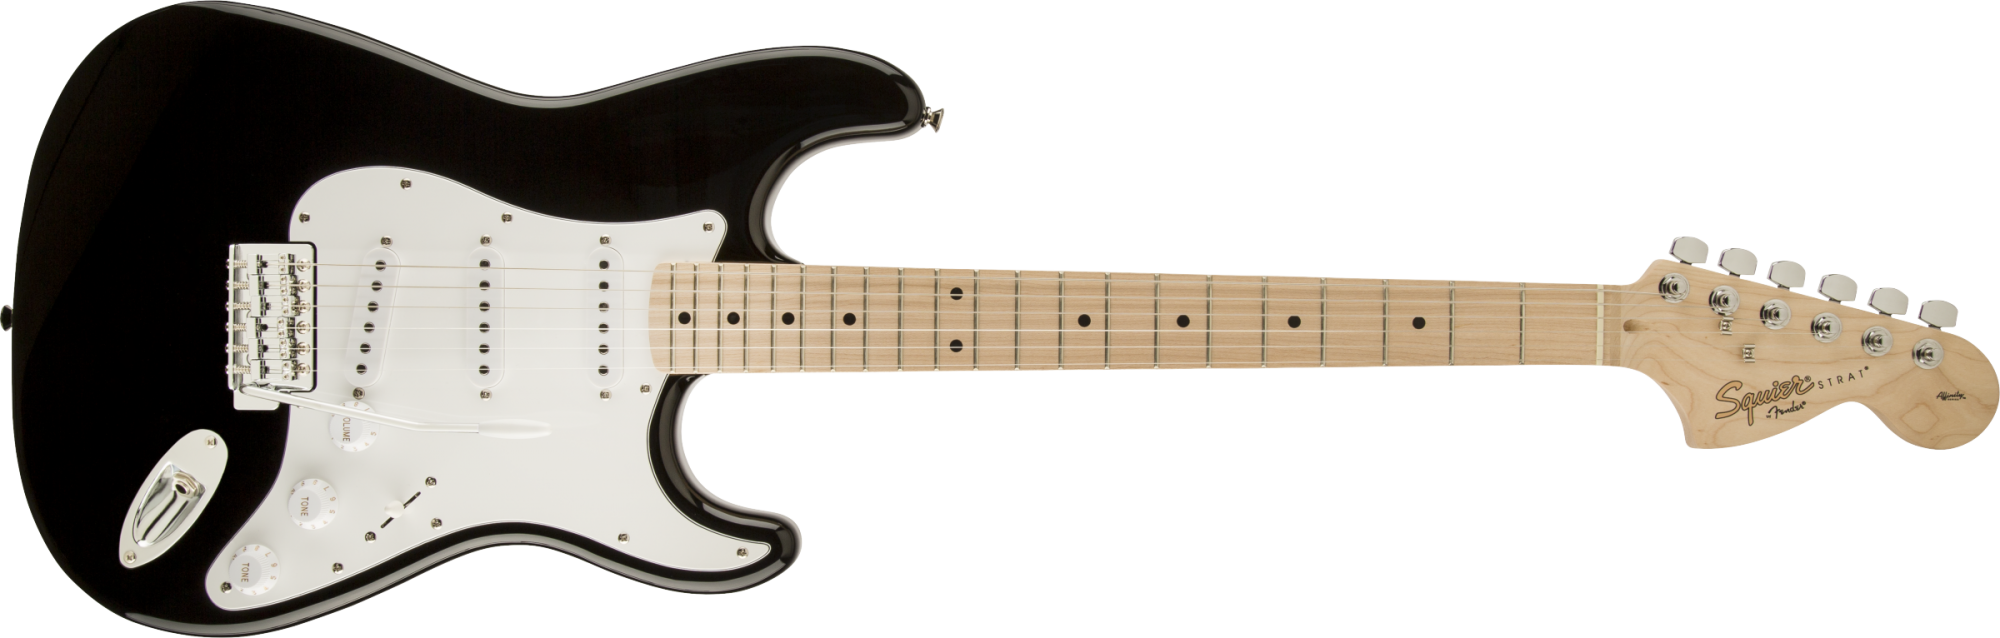 Fender/Squier Affinity Series Stratocaster, Maple Fingerboard, Black